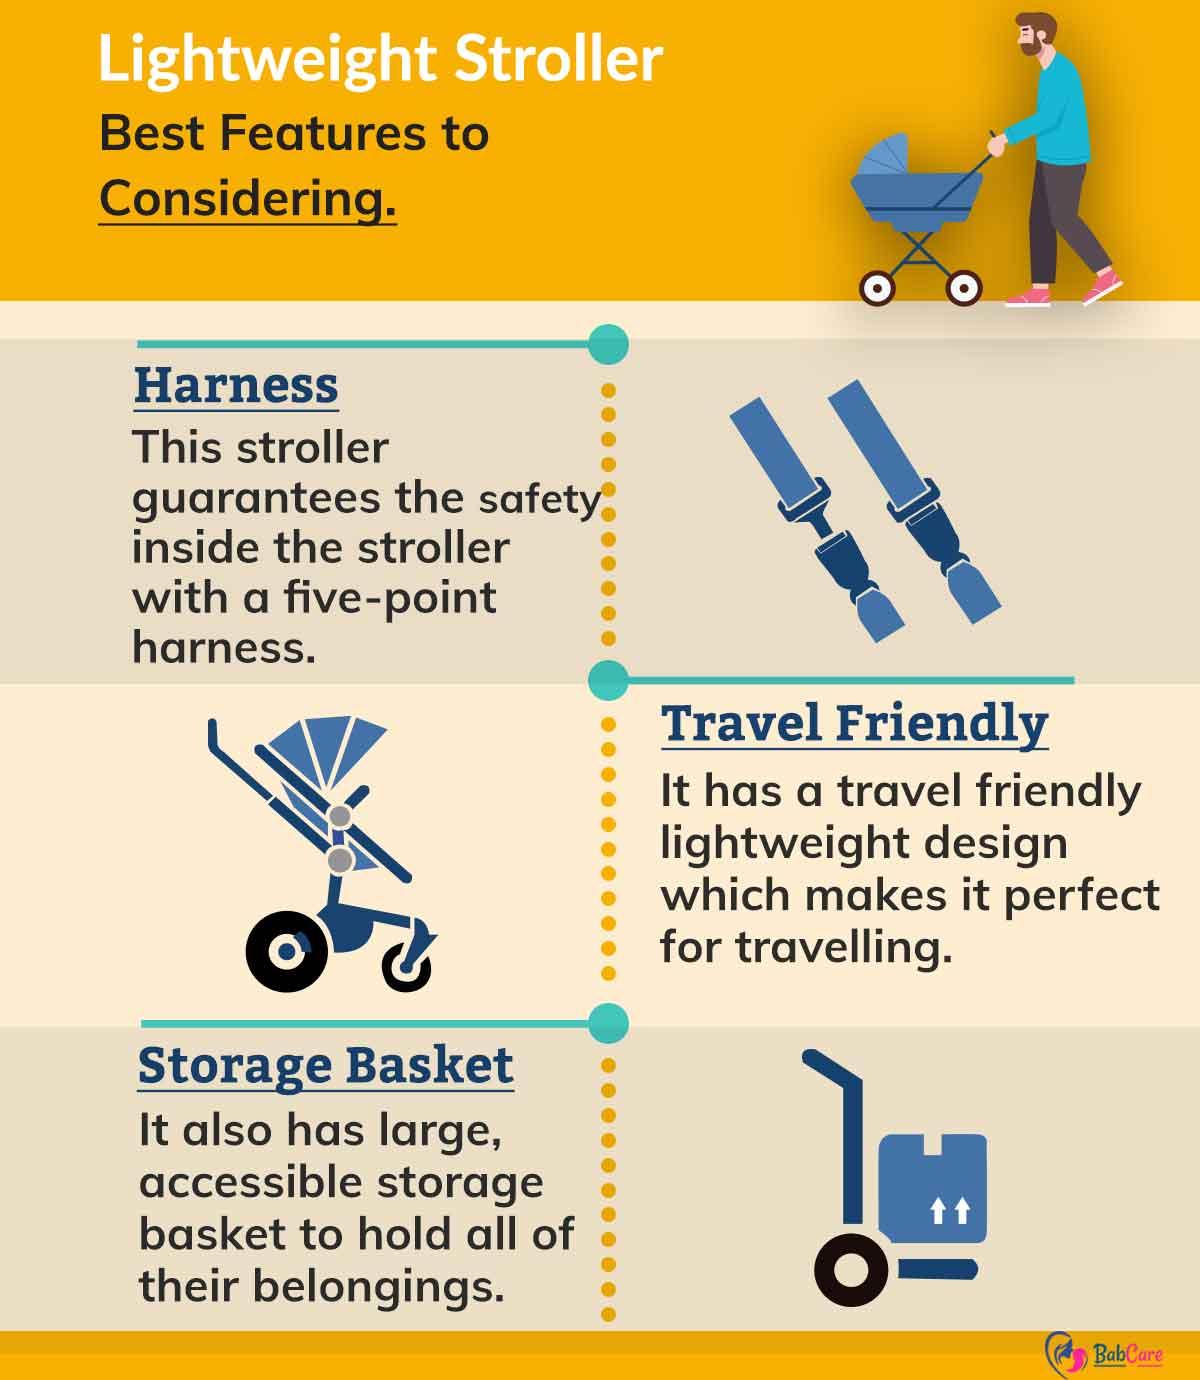 Kolcraft stroller harness, travel friendly, storage basket